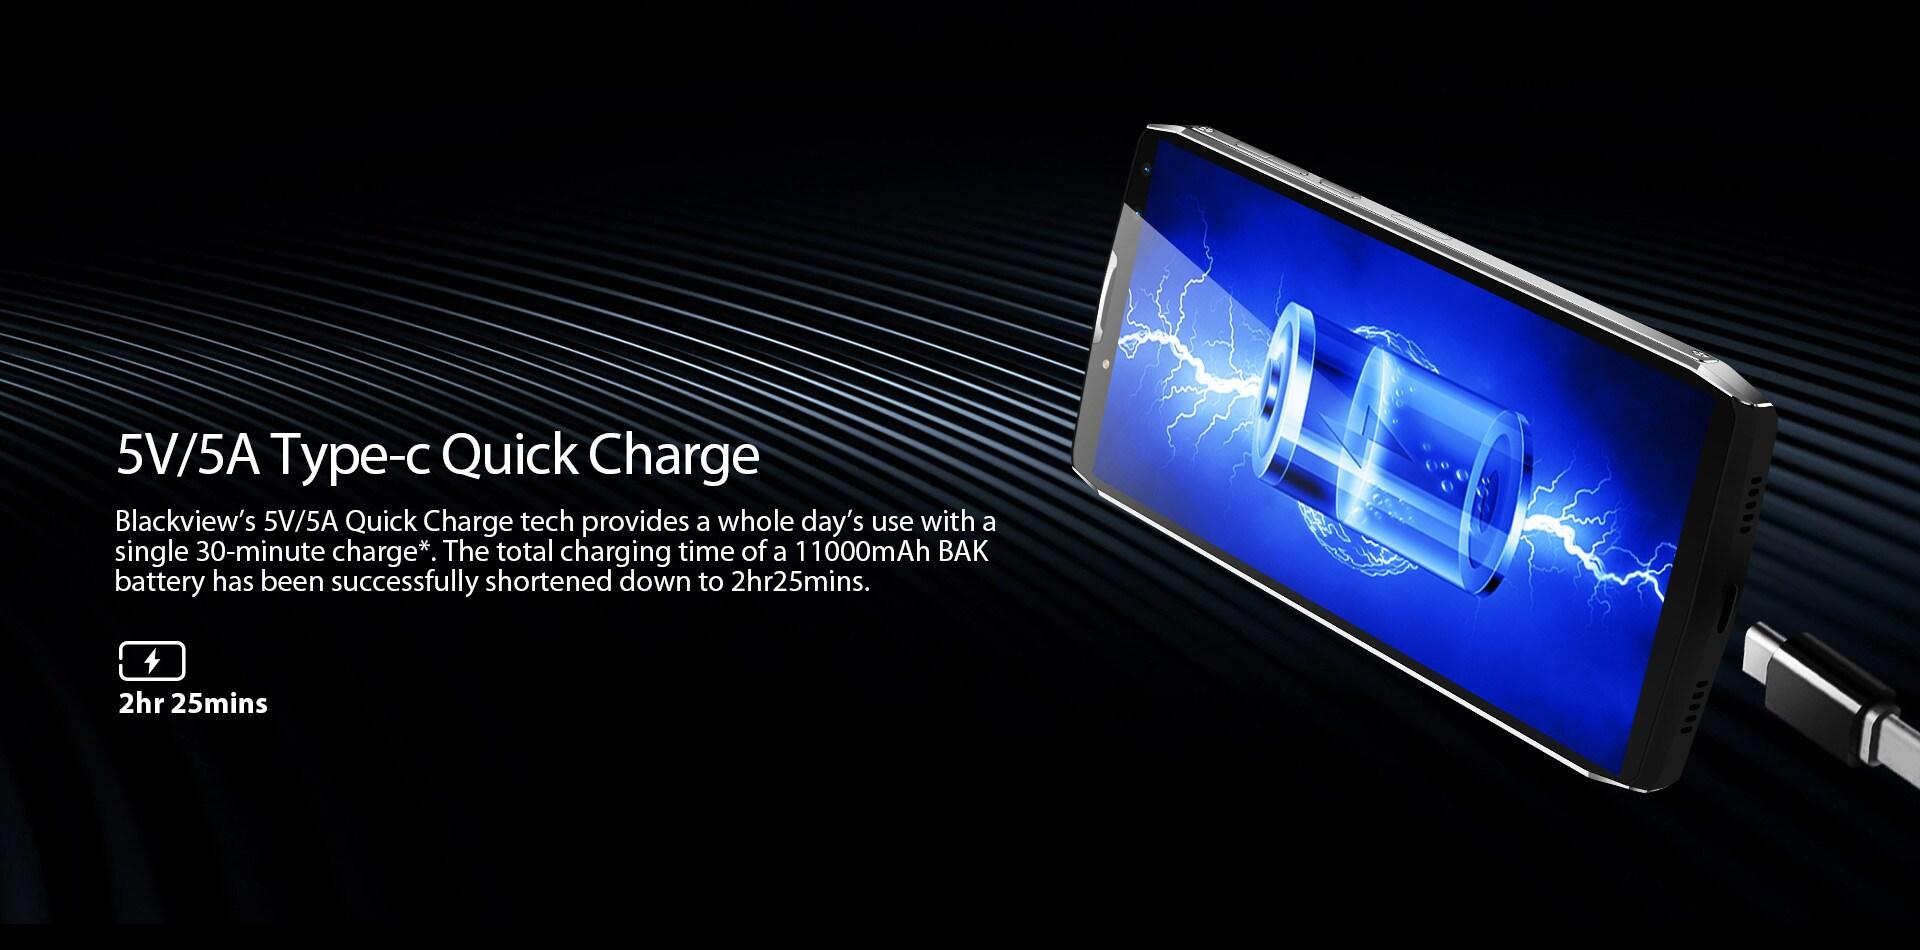 Blackview P10000 Pro 5.99 Inch FHD+ Full Screen 4GB RAM + 64GB ROM MT6763 Octa Core Smartphone Glass Black - 10